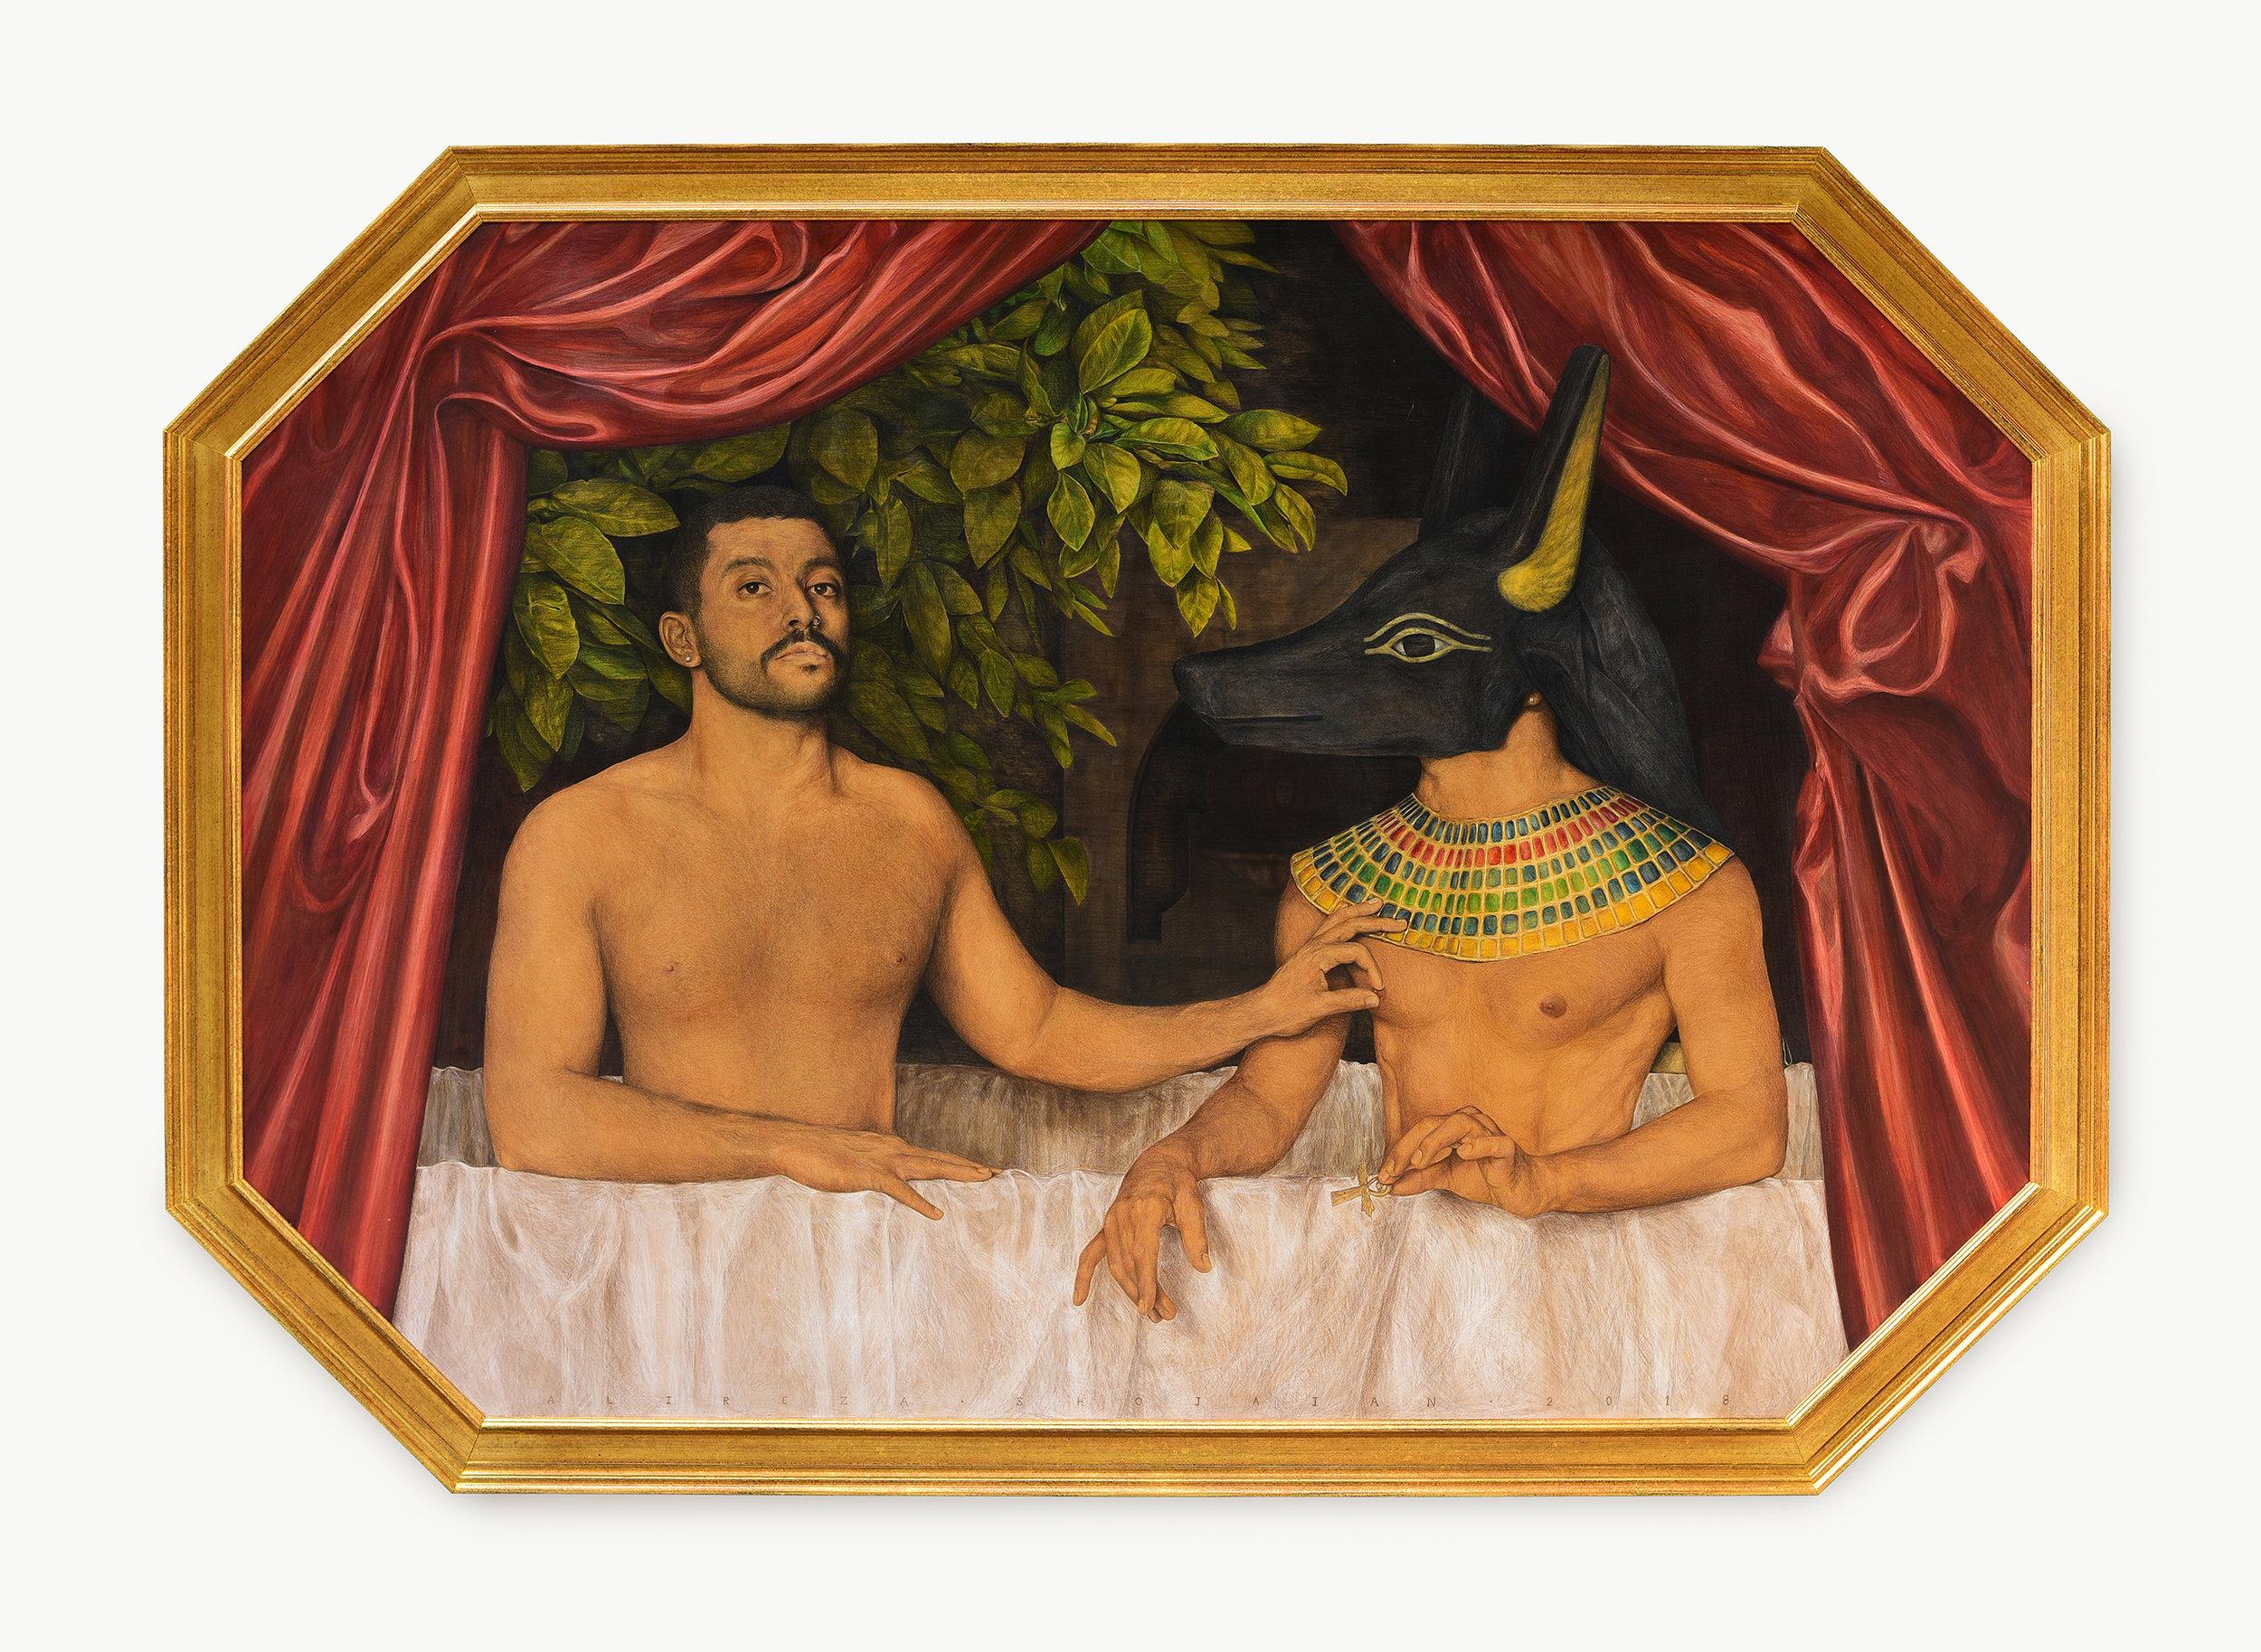 'Hamed Sinno et un de ses Frères' Acrylic and Color Pencil on Wood Board. 150 x 220 cm.